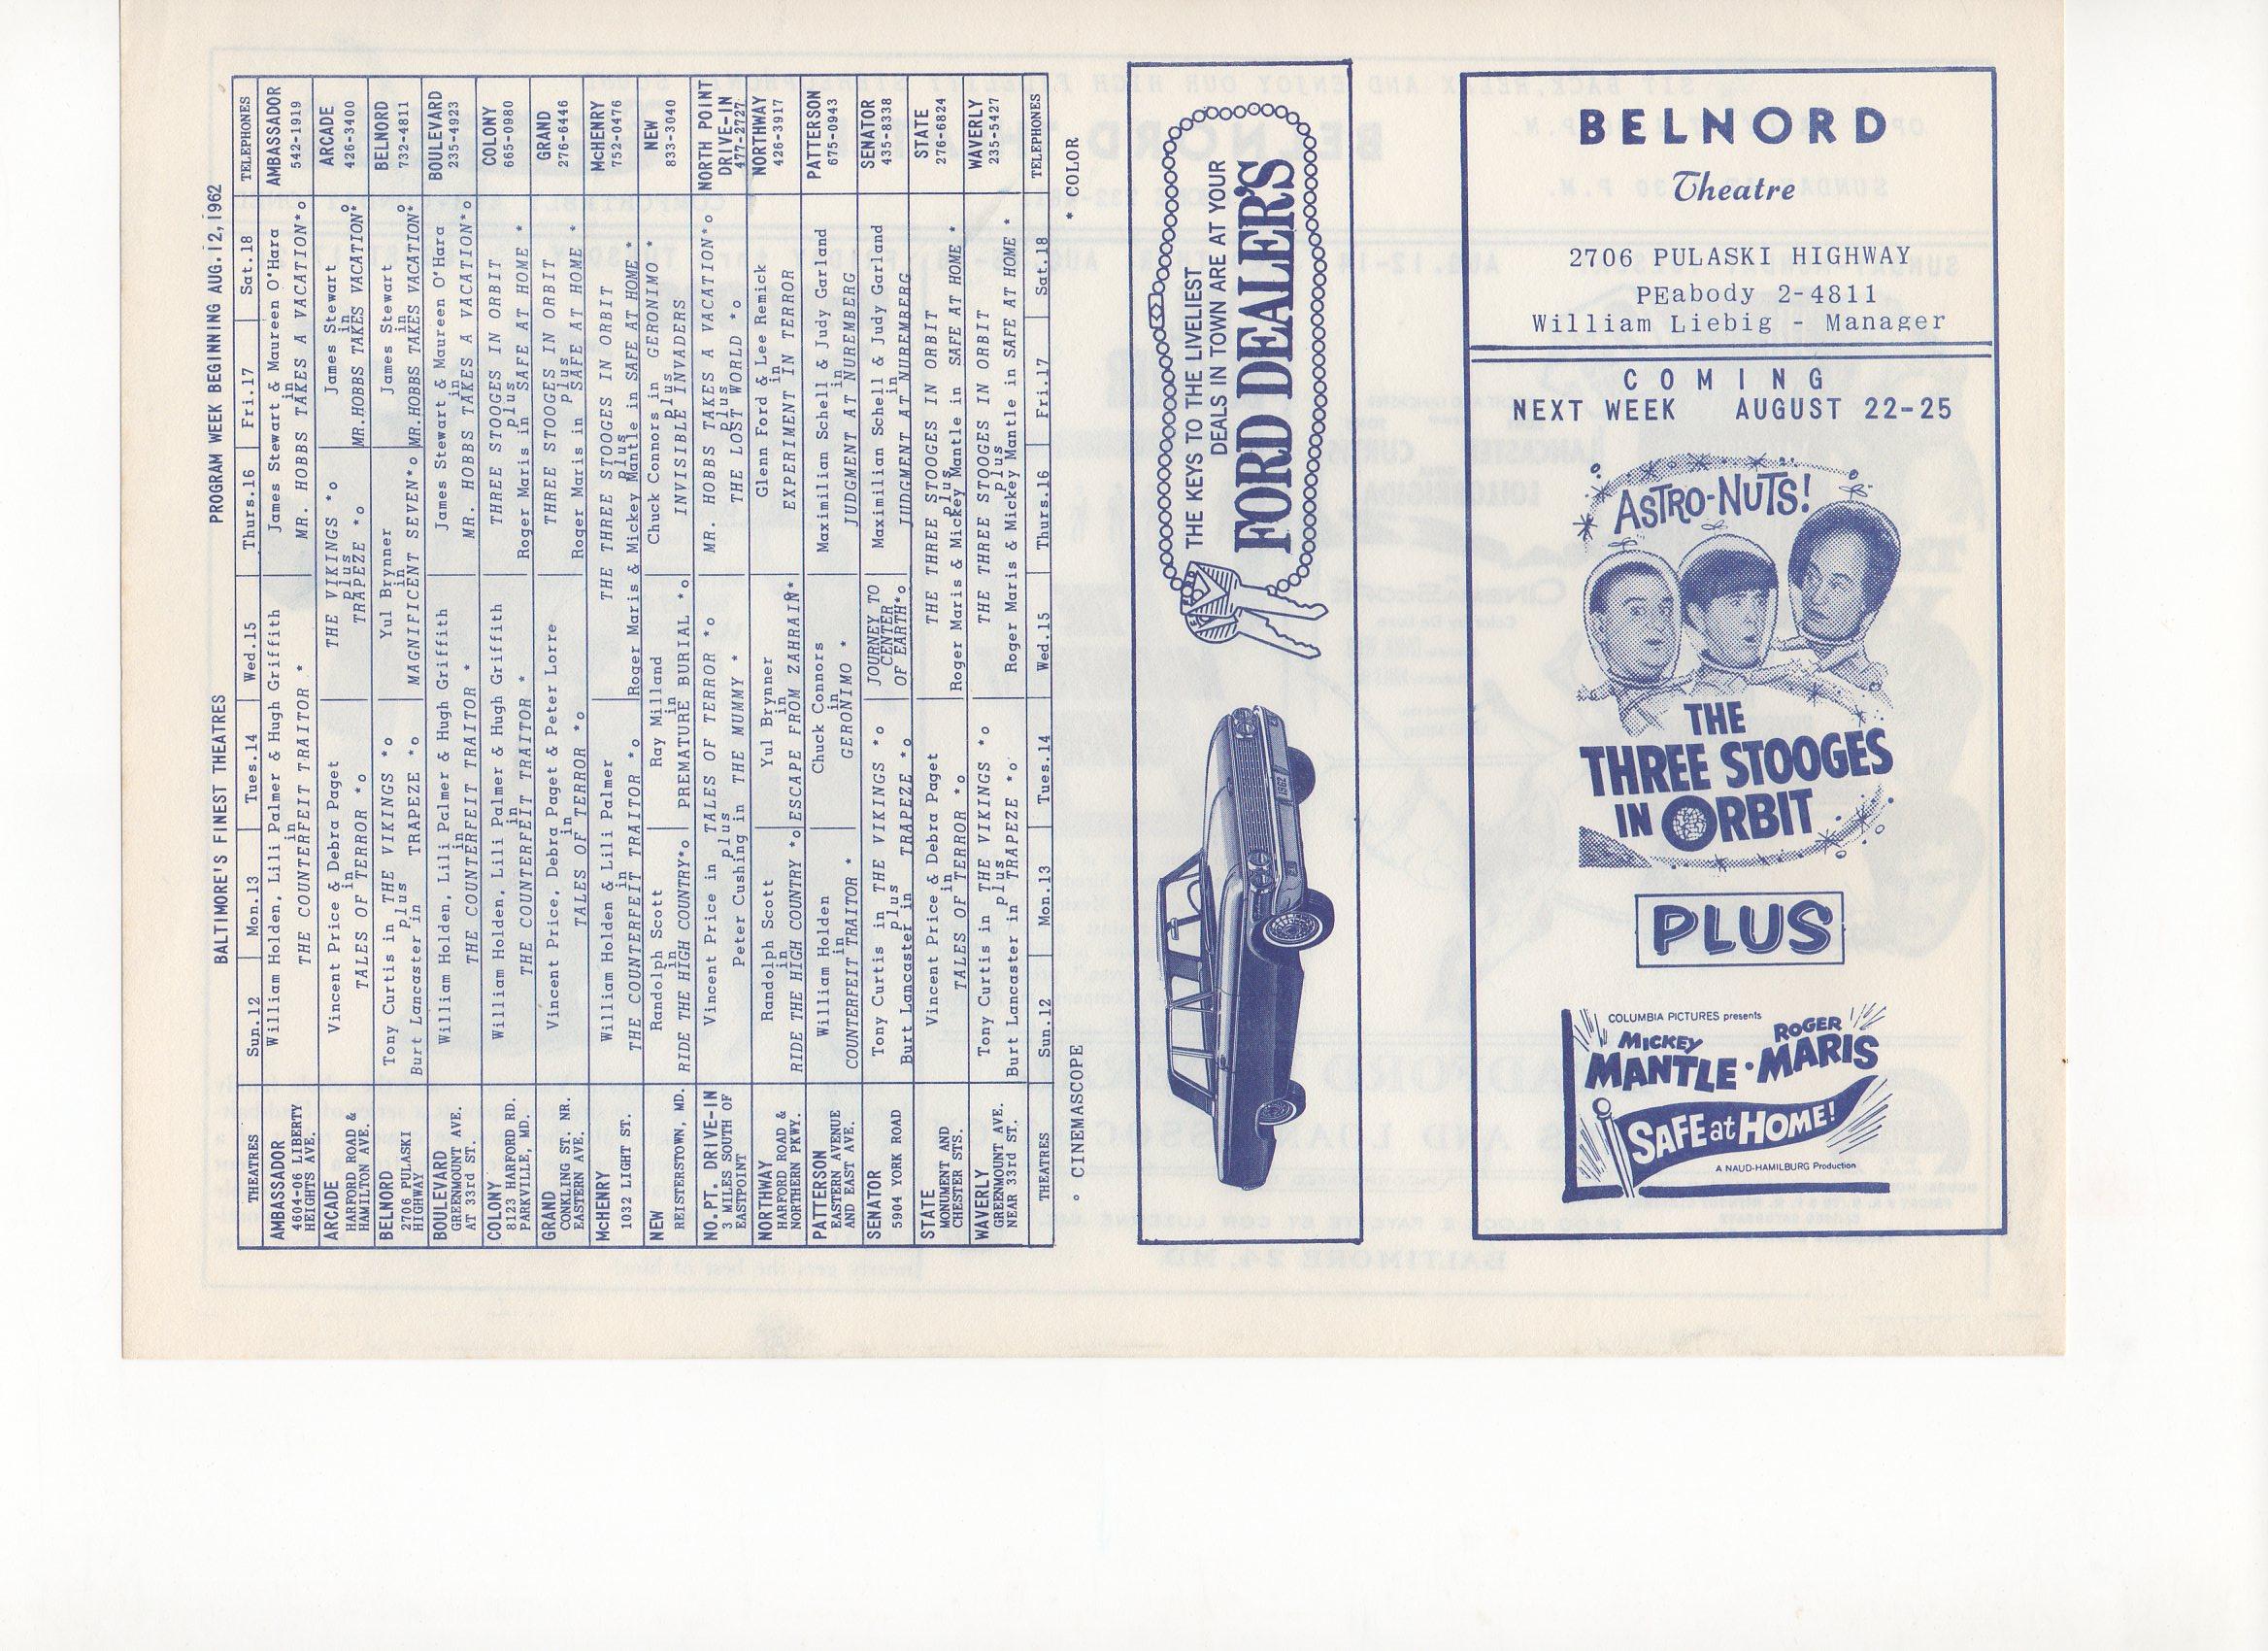 1962, belnord theatre, baltimore, md., 08/22/1962